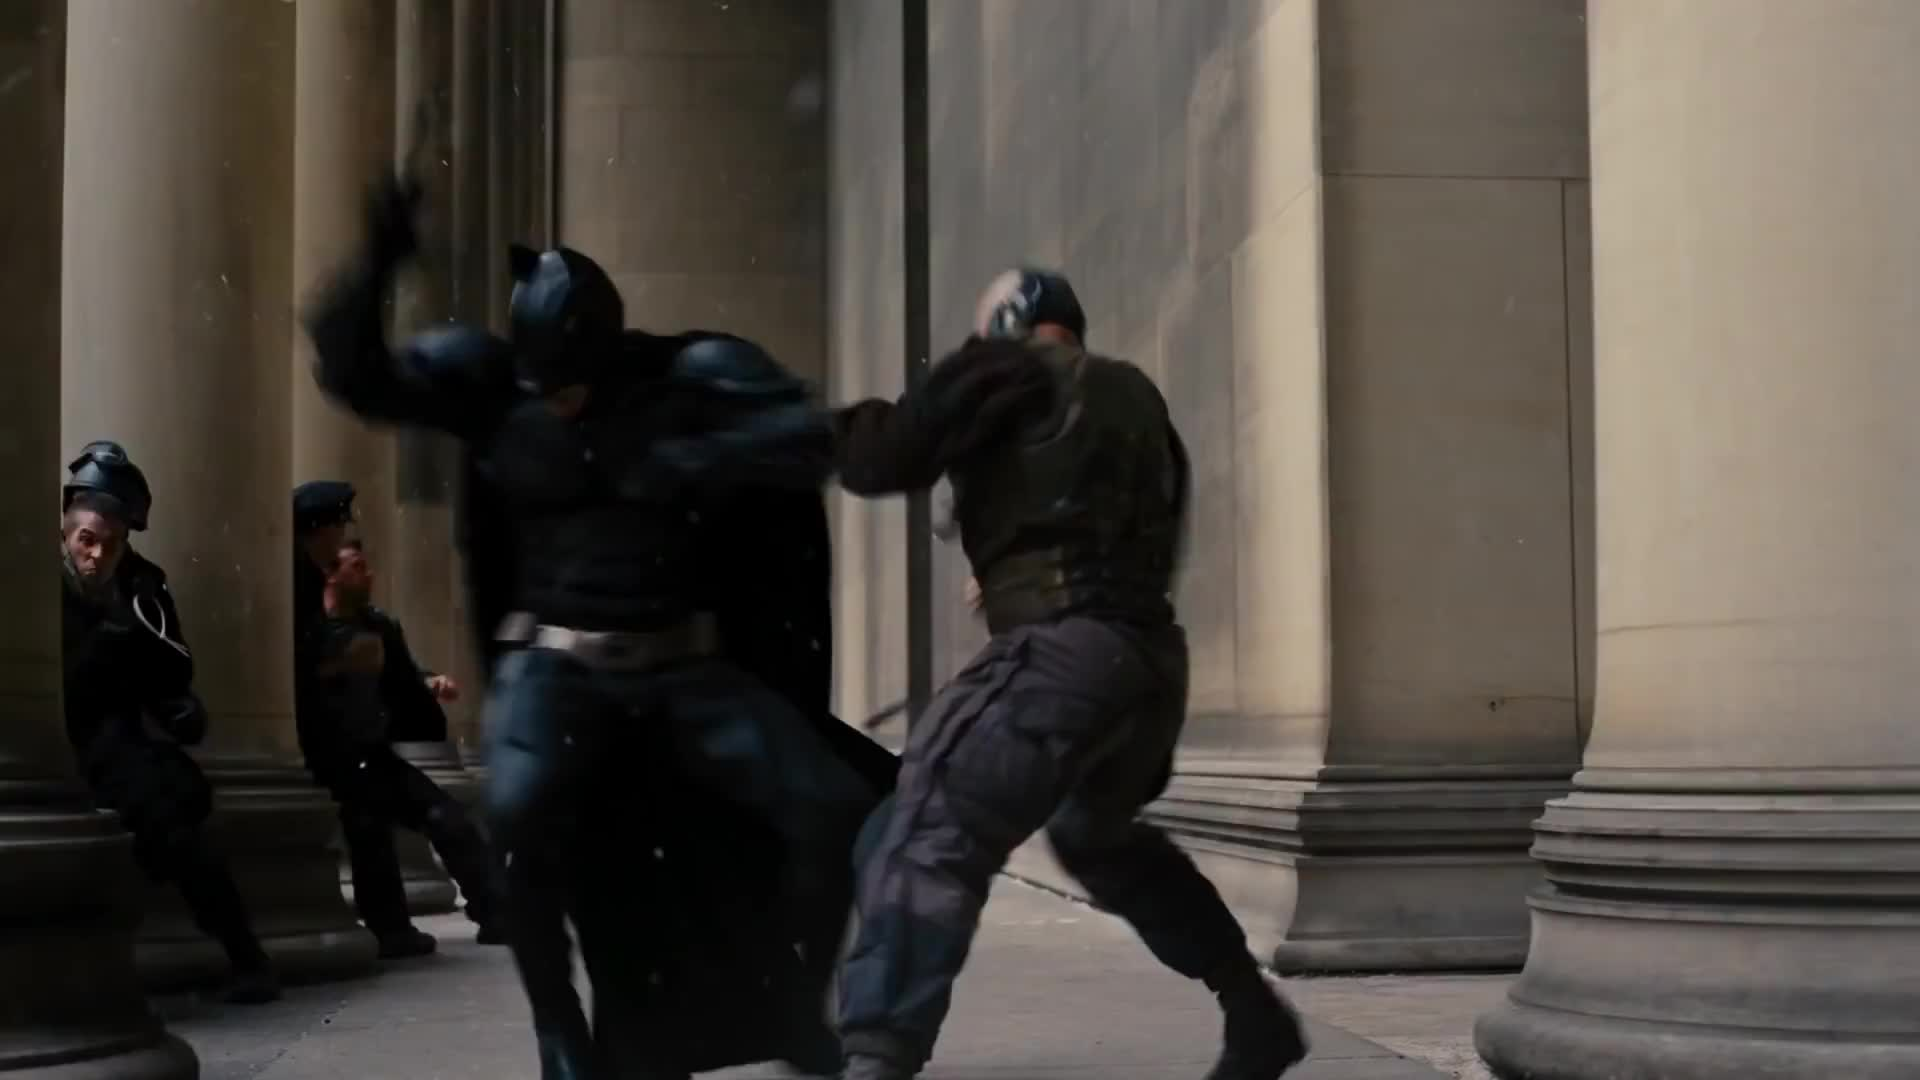 bane, bane vs batman, batman, batman vs bane, batman vs bane fight scene, batman vs bane final fight, batman vs bane full fight, batman vs bane second fight, dark knight rises, fight, fight scene, fighting, punch, the dark knight rises, the dark knight rises fight, The Dark Knight Rises (2012) - Batman vs. Bane (HD) GIFs